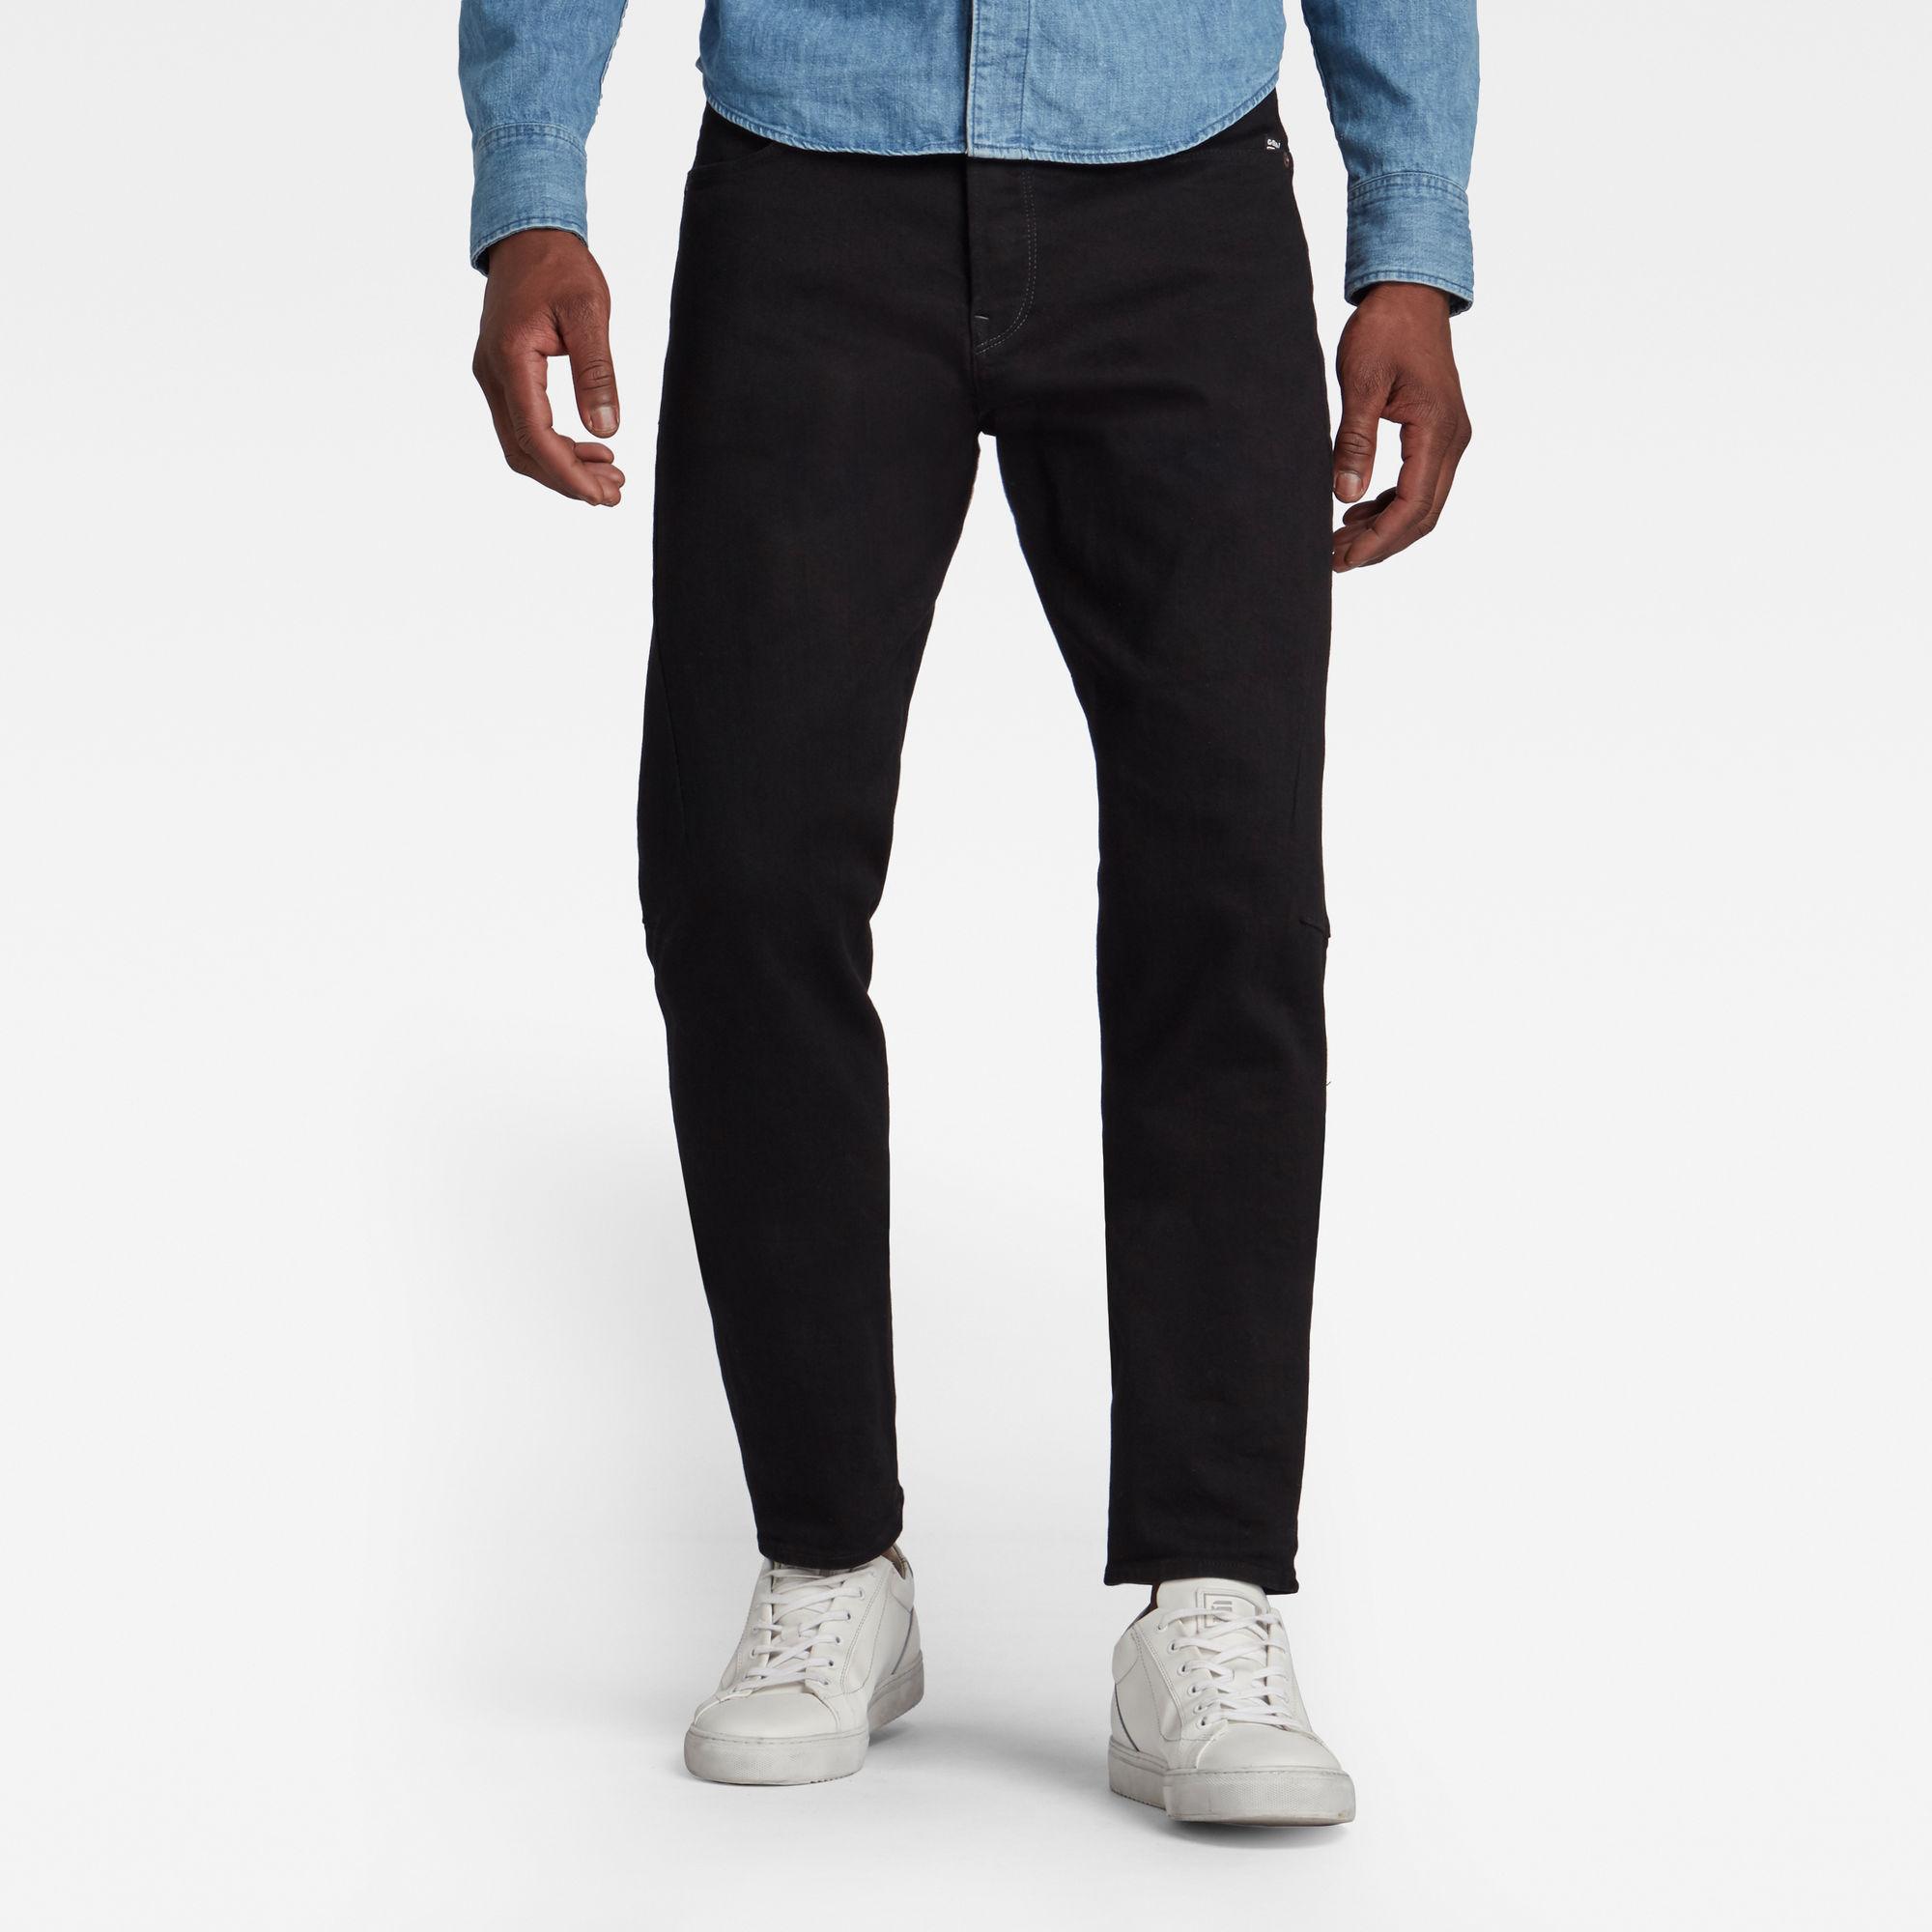 G-Star RAW Heren Scutar 3D Slim Tapered Jeans Zwart